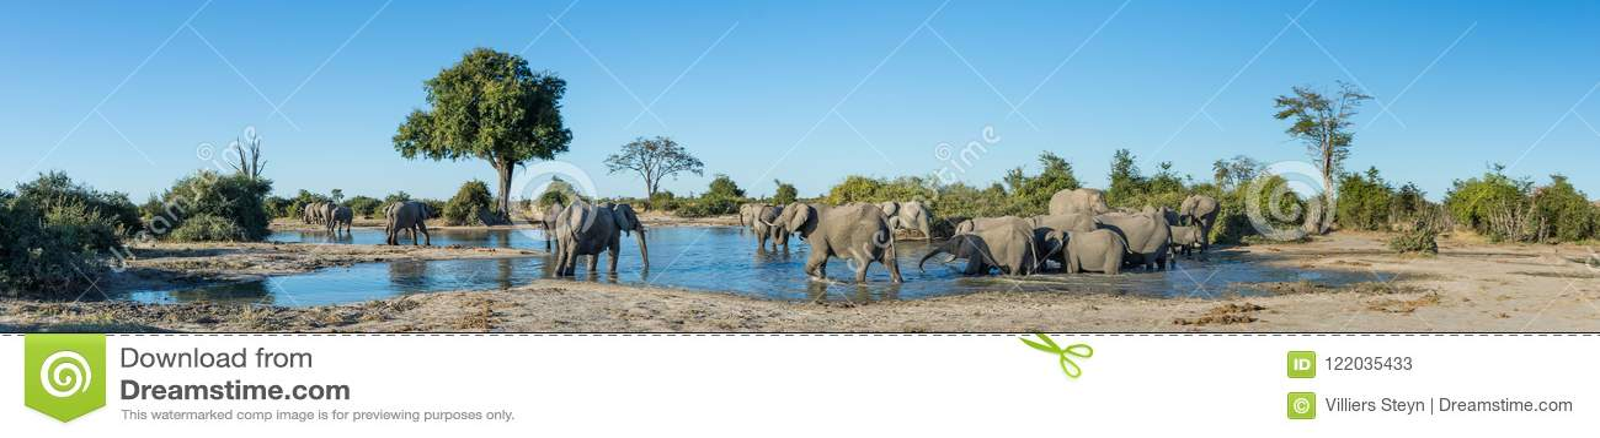 En panoramabild av en flock av elefanter på en waterhole i Savute